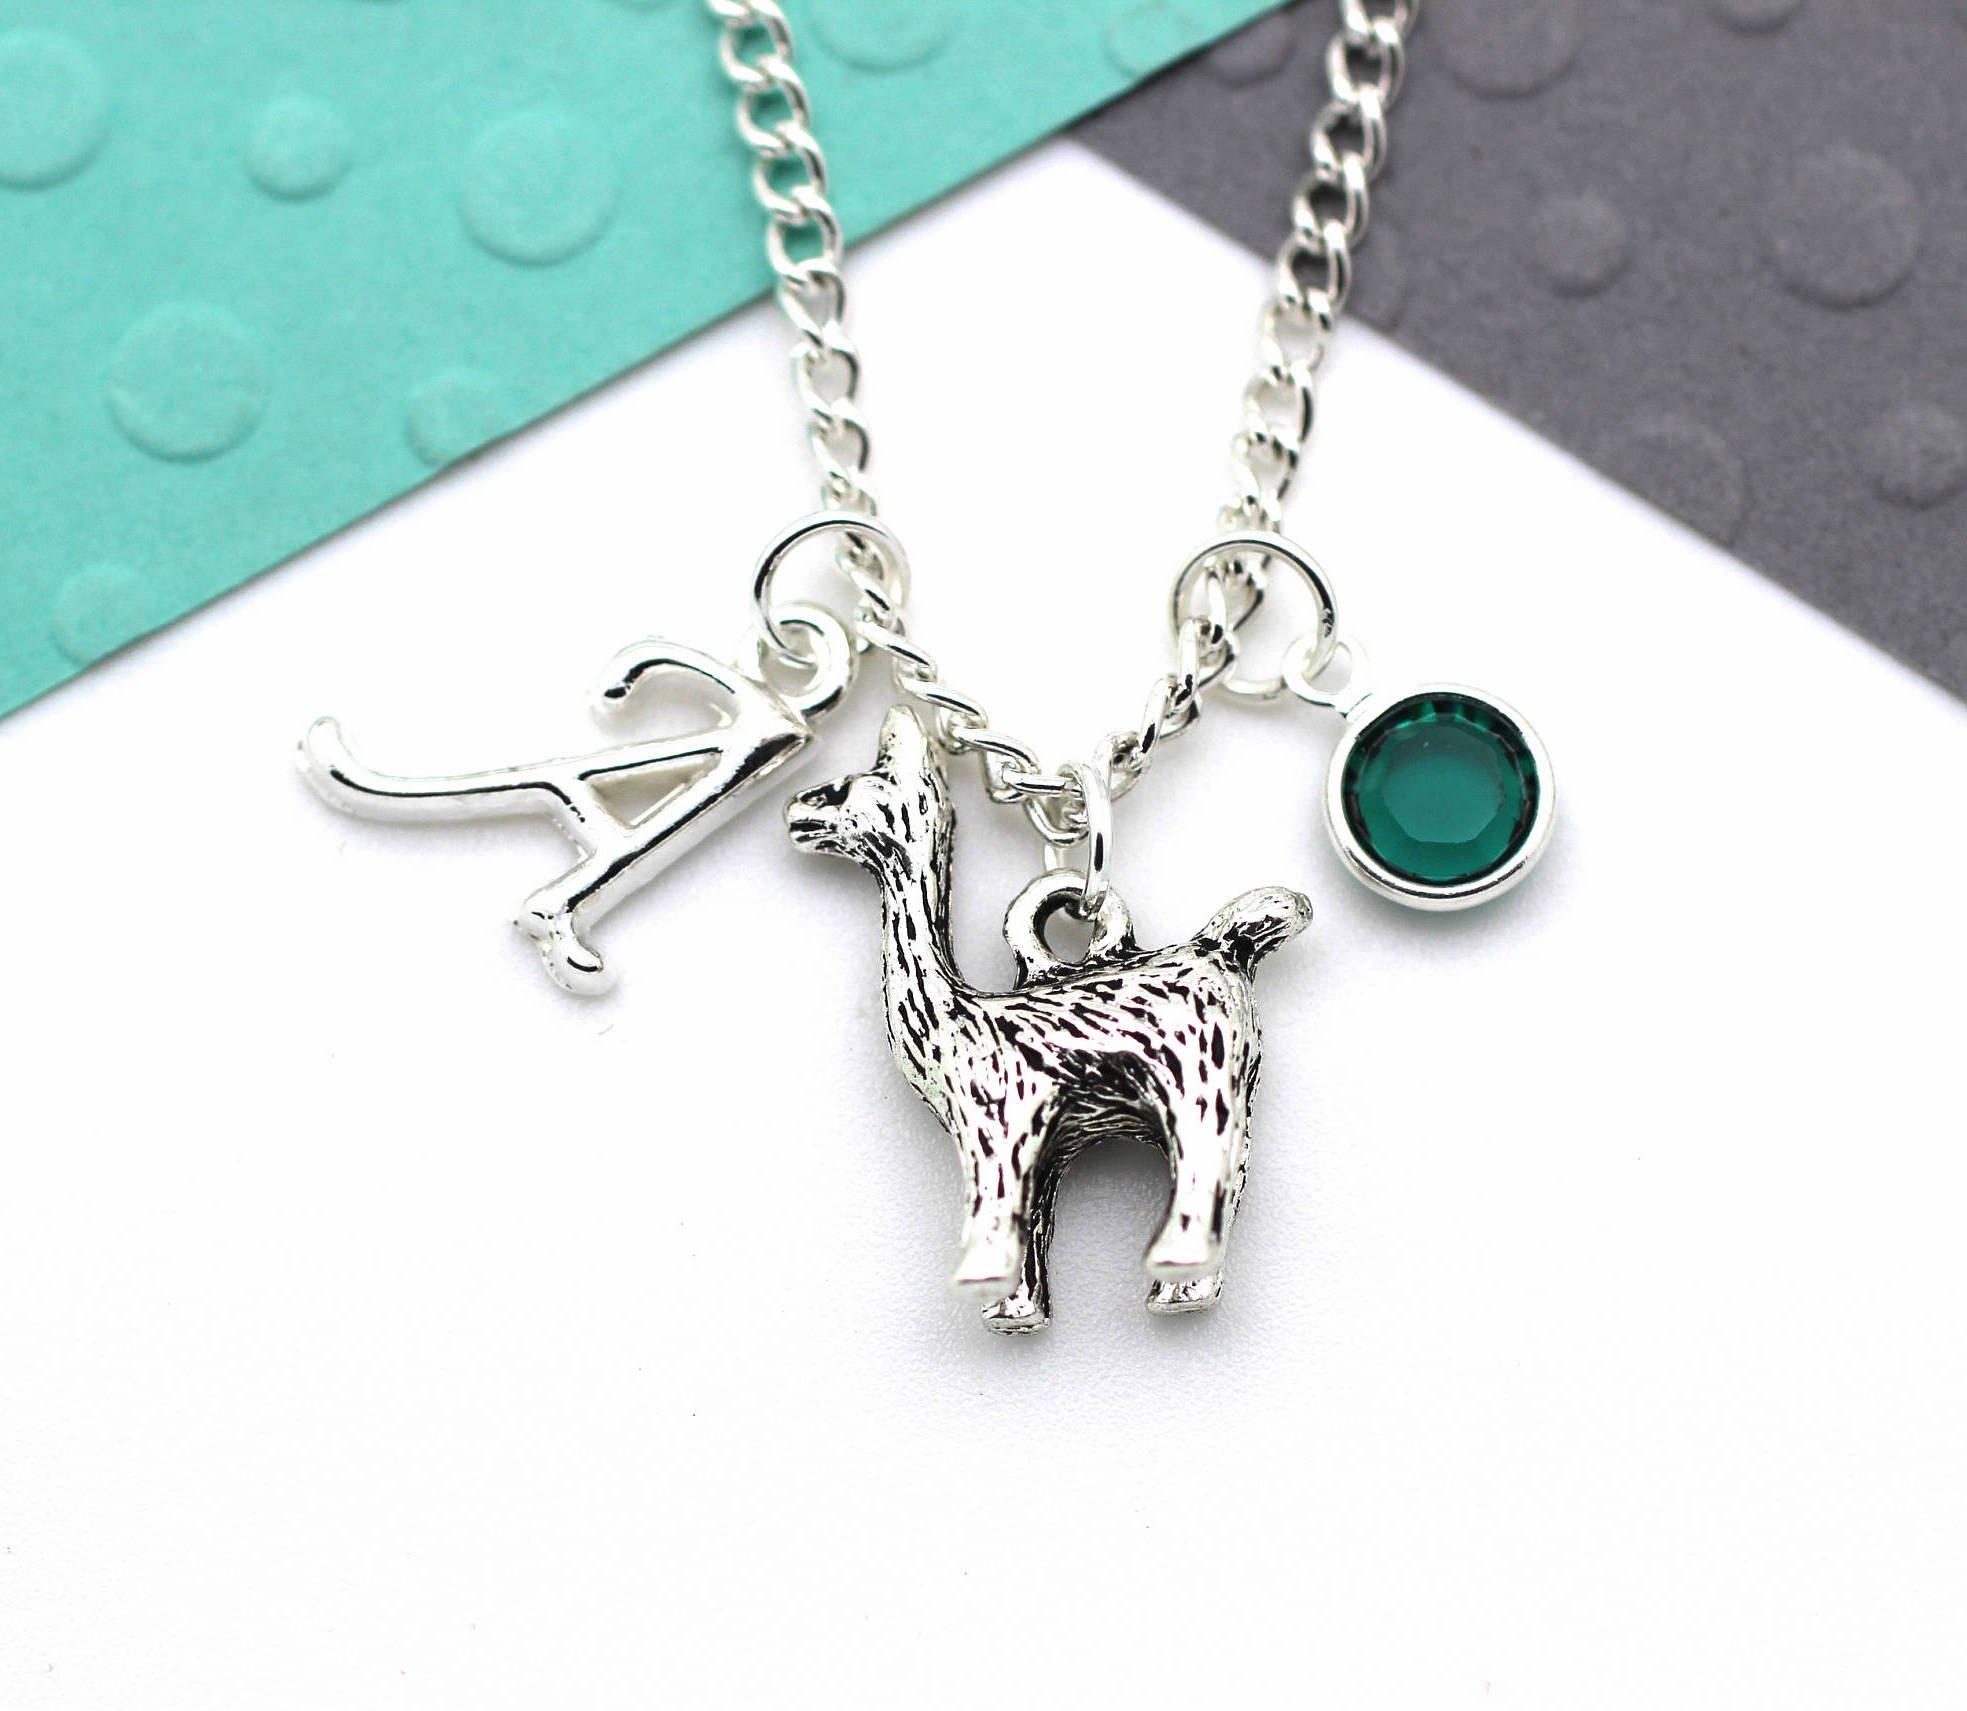 518b25619c0ea Personalised Alpaca Necklace, Llama Custom Charm Initial Necklace,  Personalised Swarovski Birthstone & Name Gift